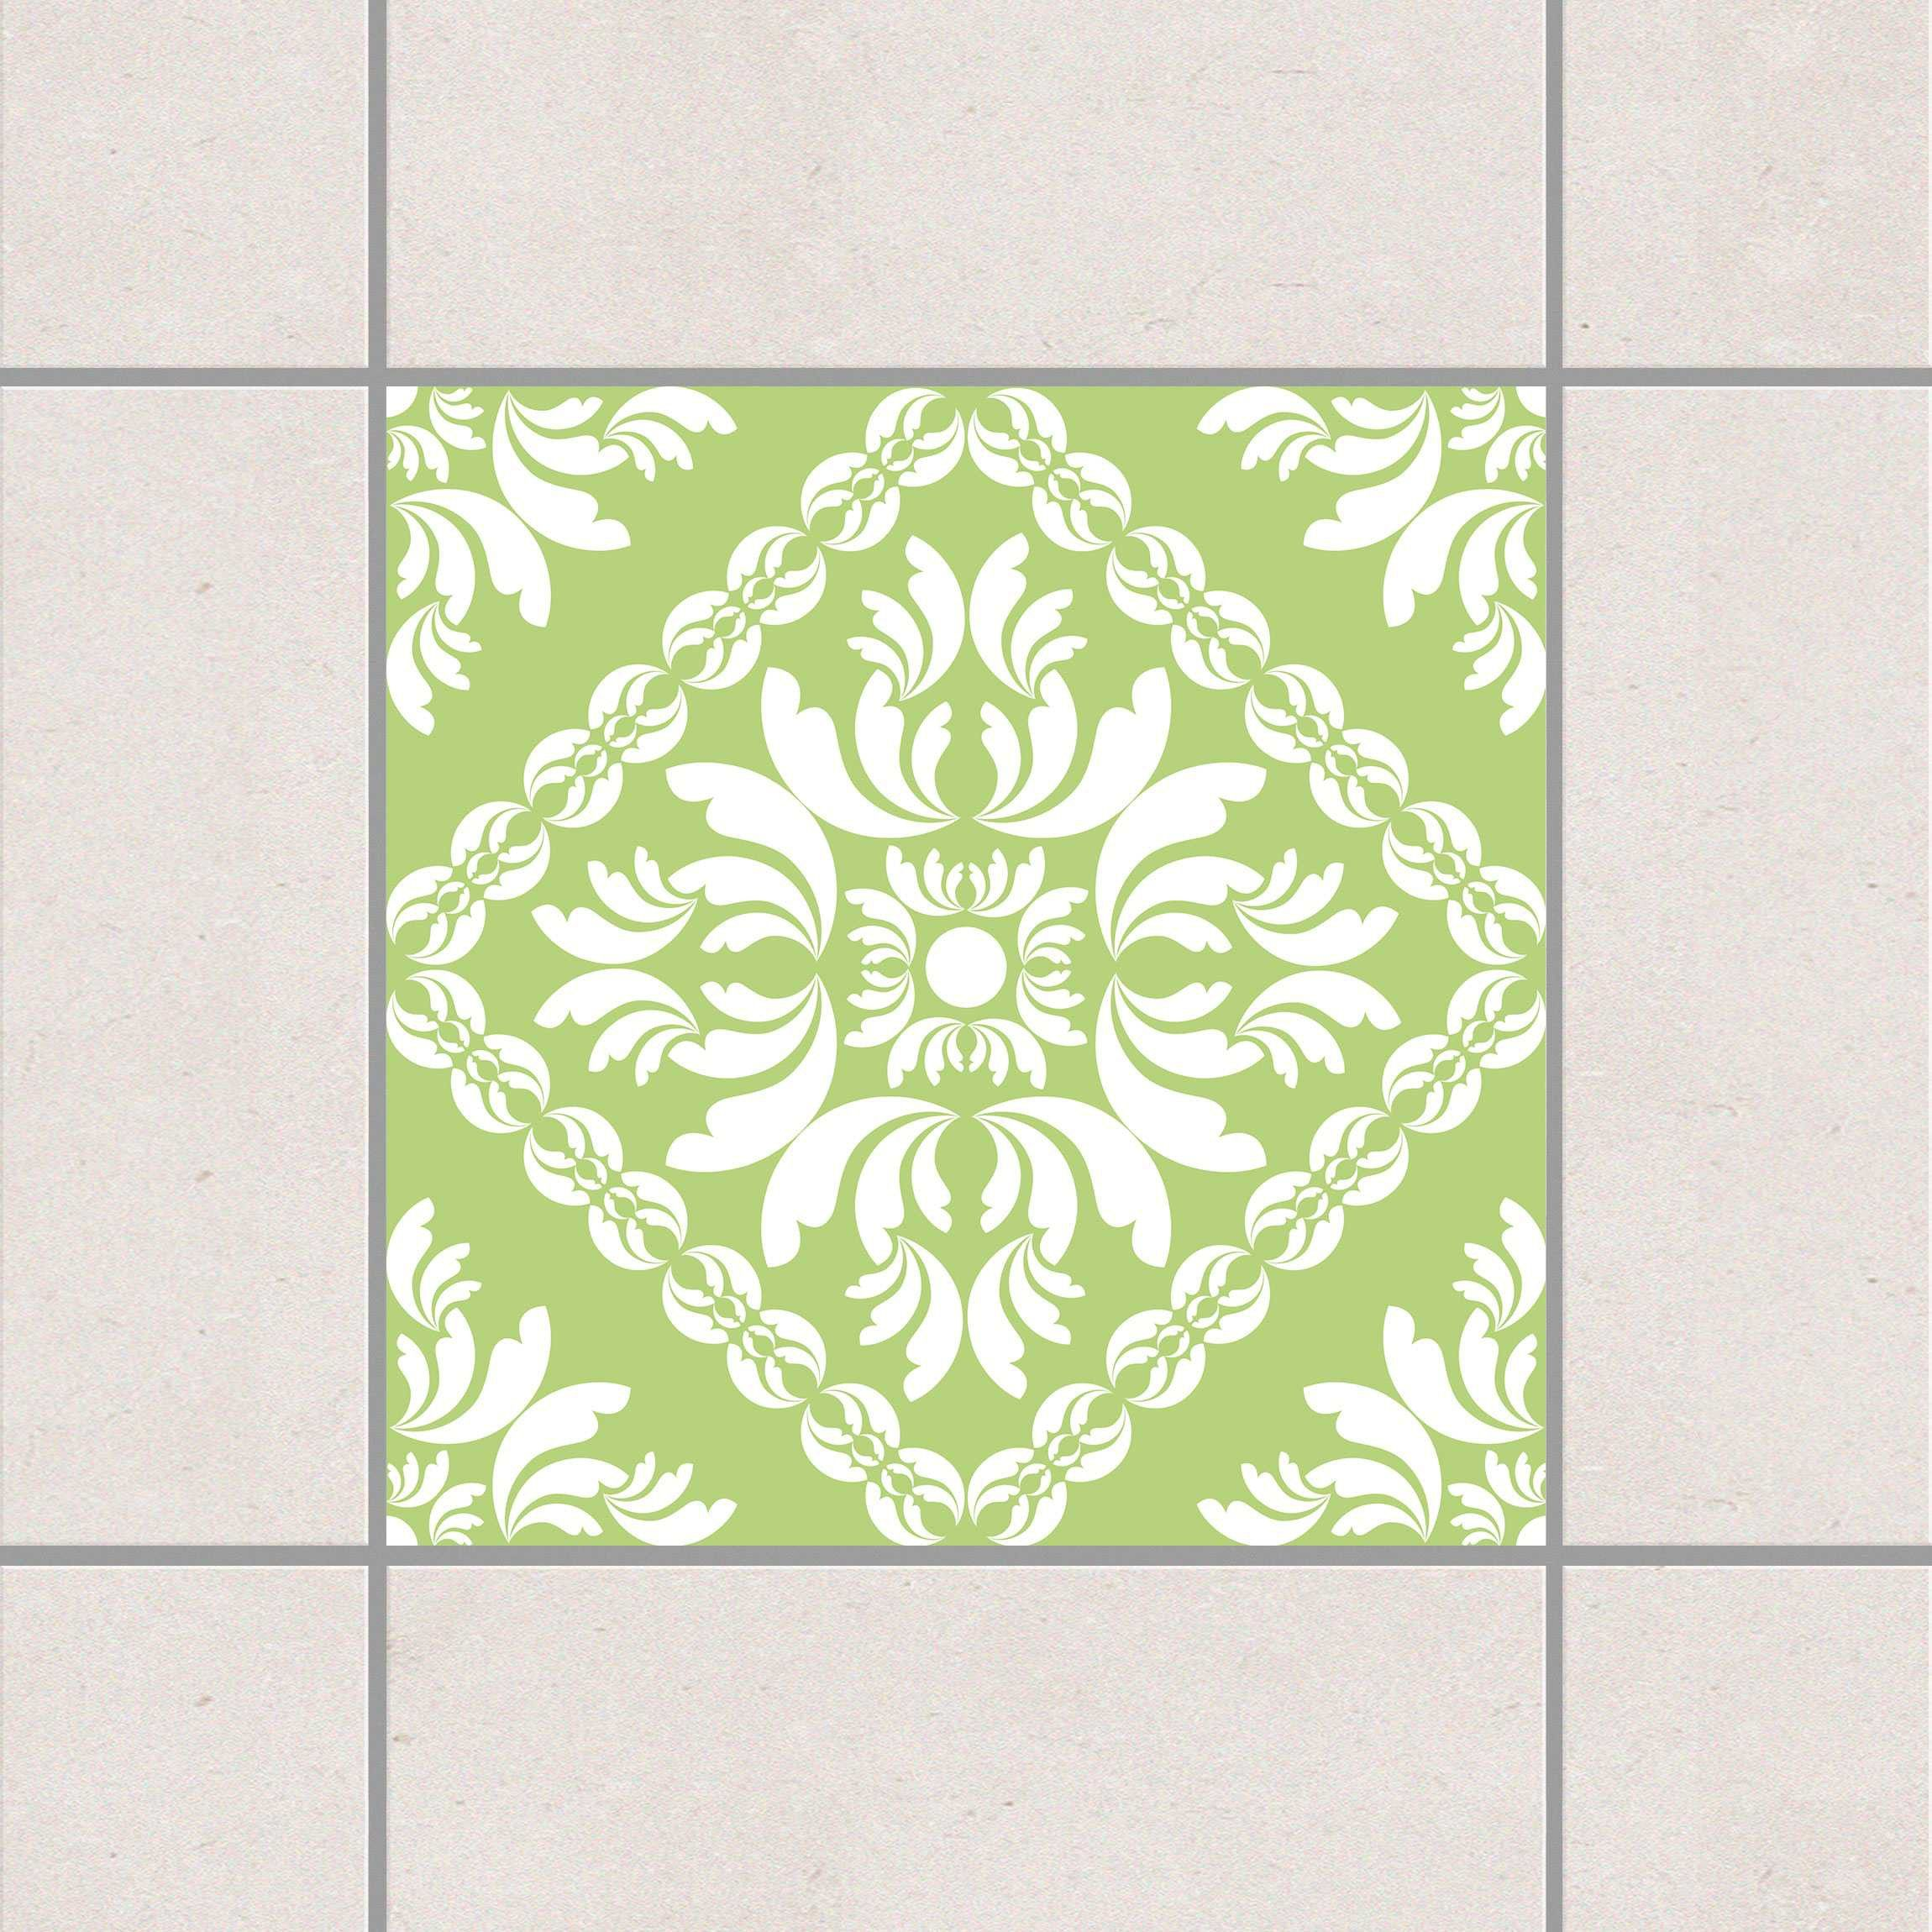 Fliesenaufkleber - Vera Rosa Spring Green 15x15 cm - Fliesensticker Set Grün